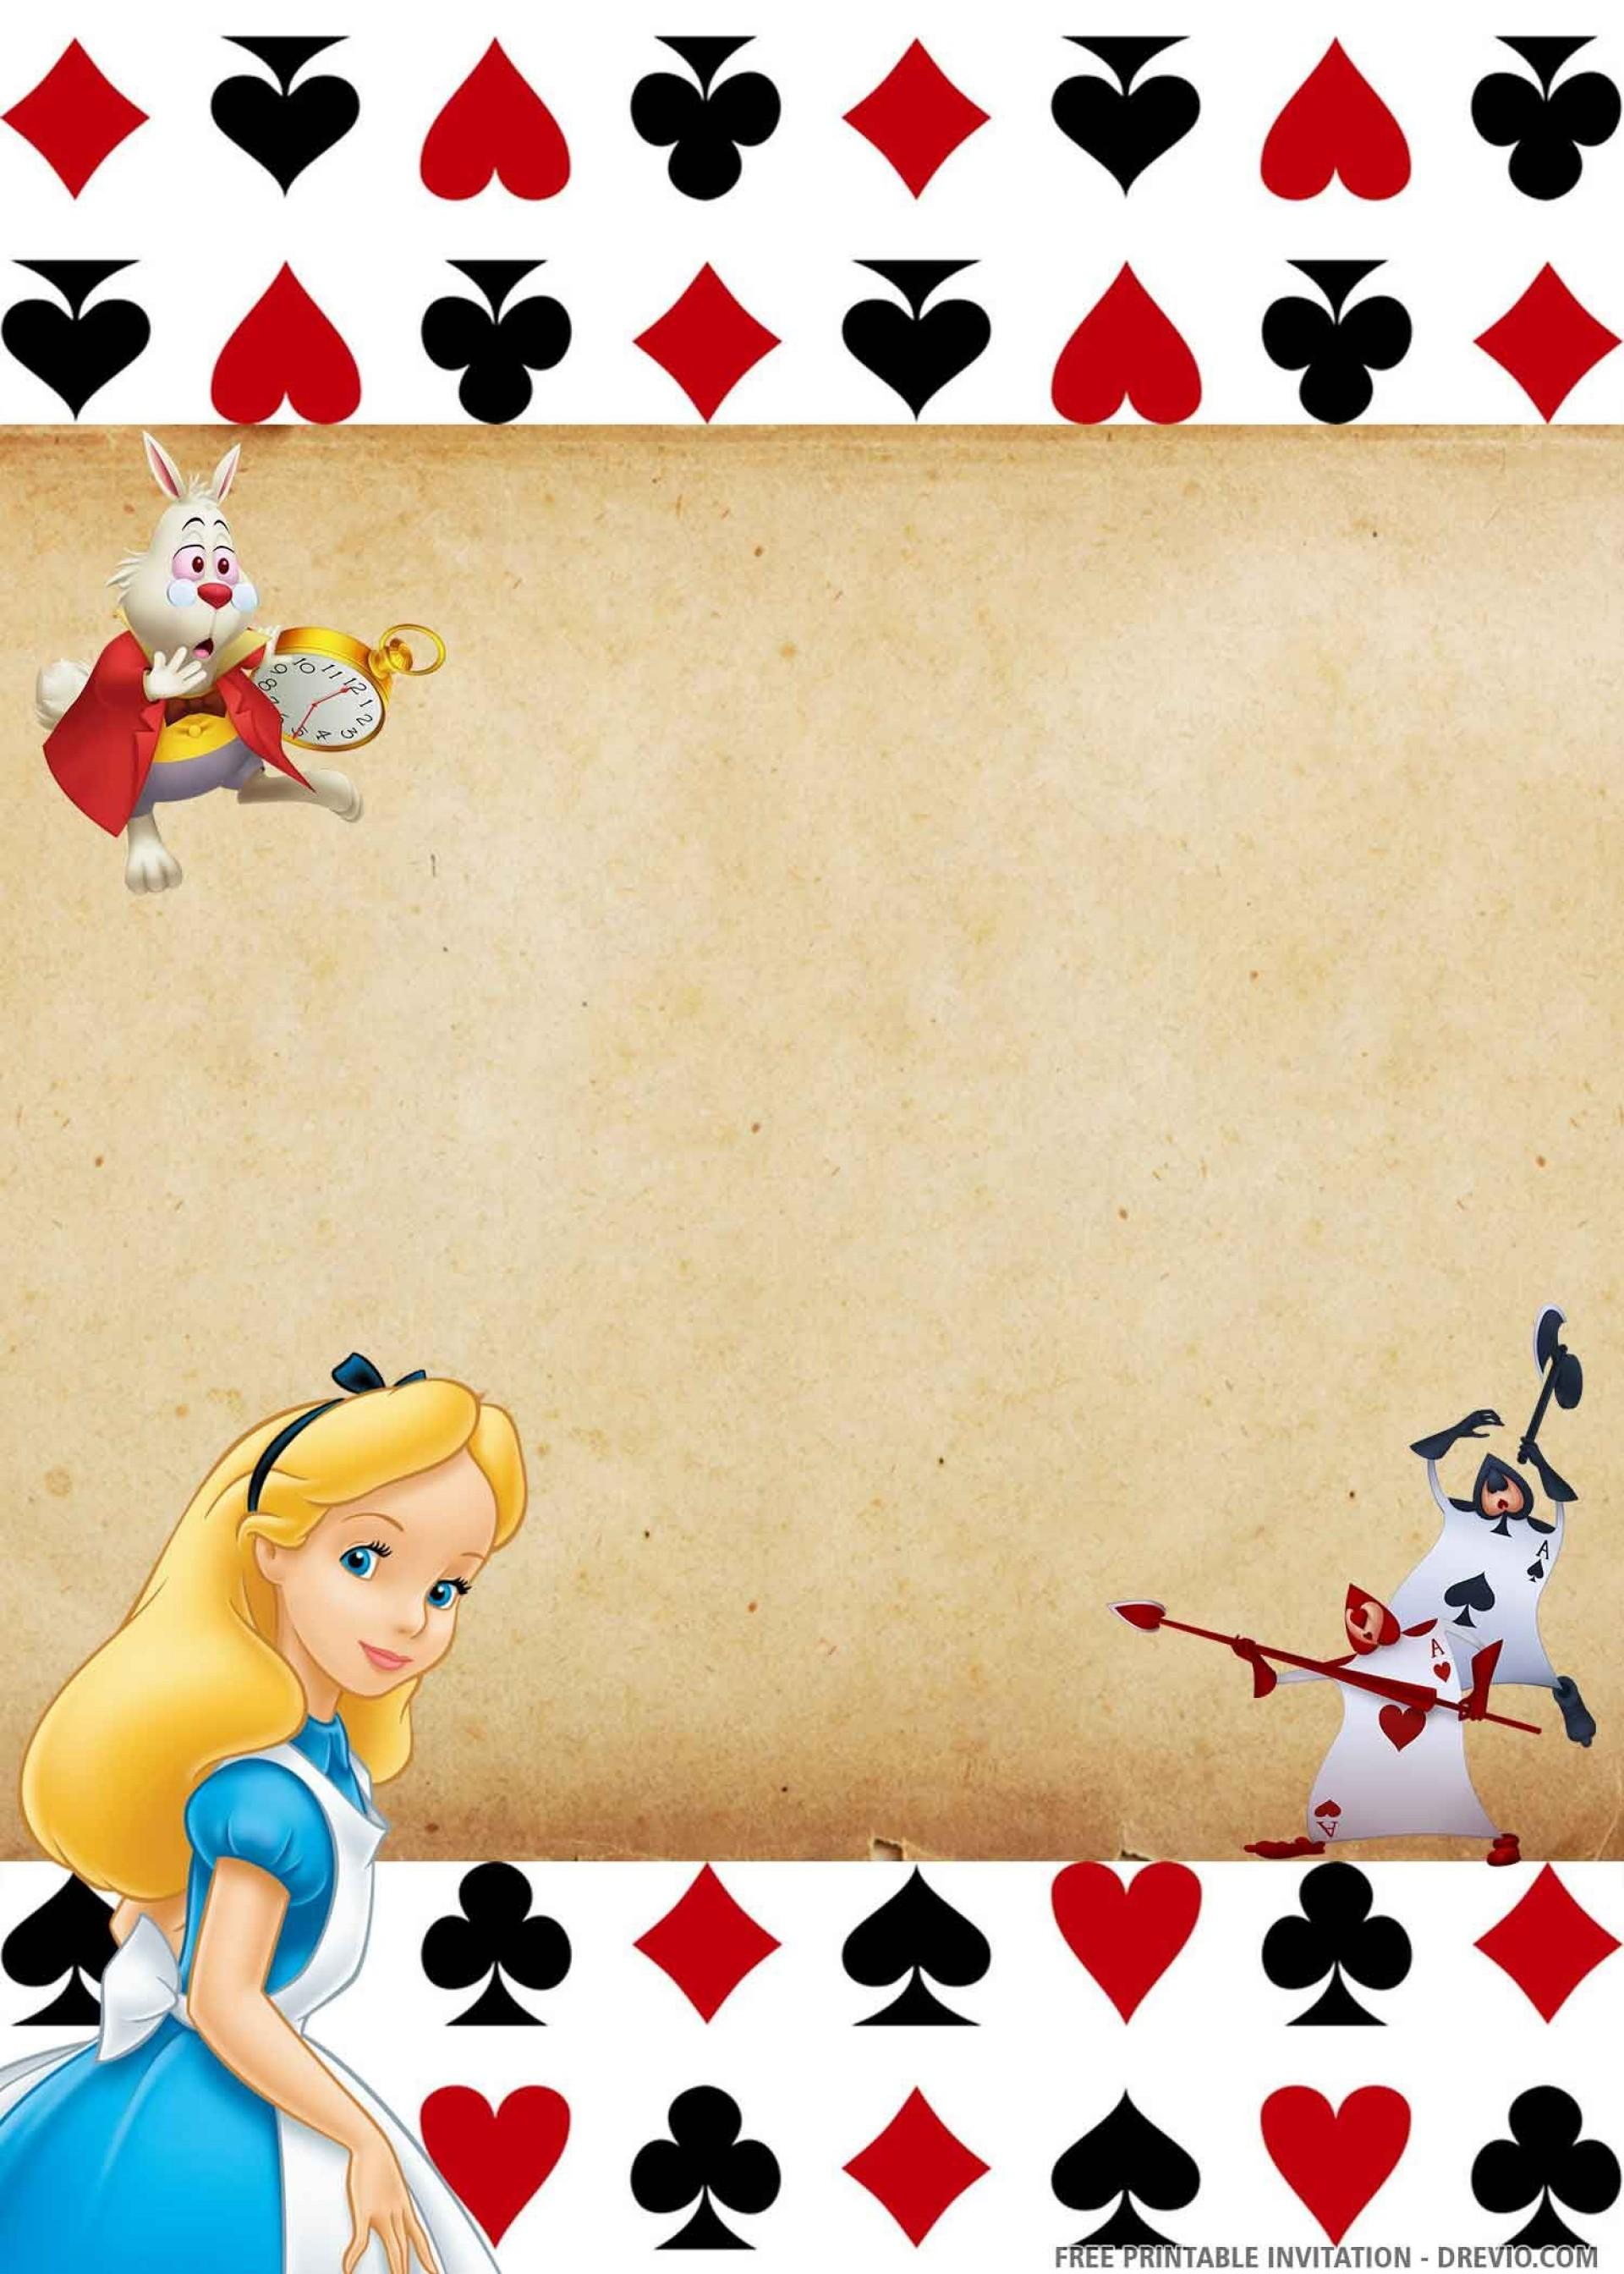 007 Astounding Alice In Wonderland Invitation Template High Resolution  Templates Wedding Birthday Free Tea Party1920